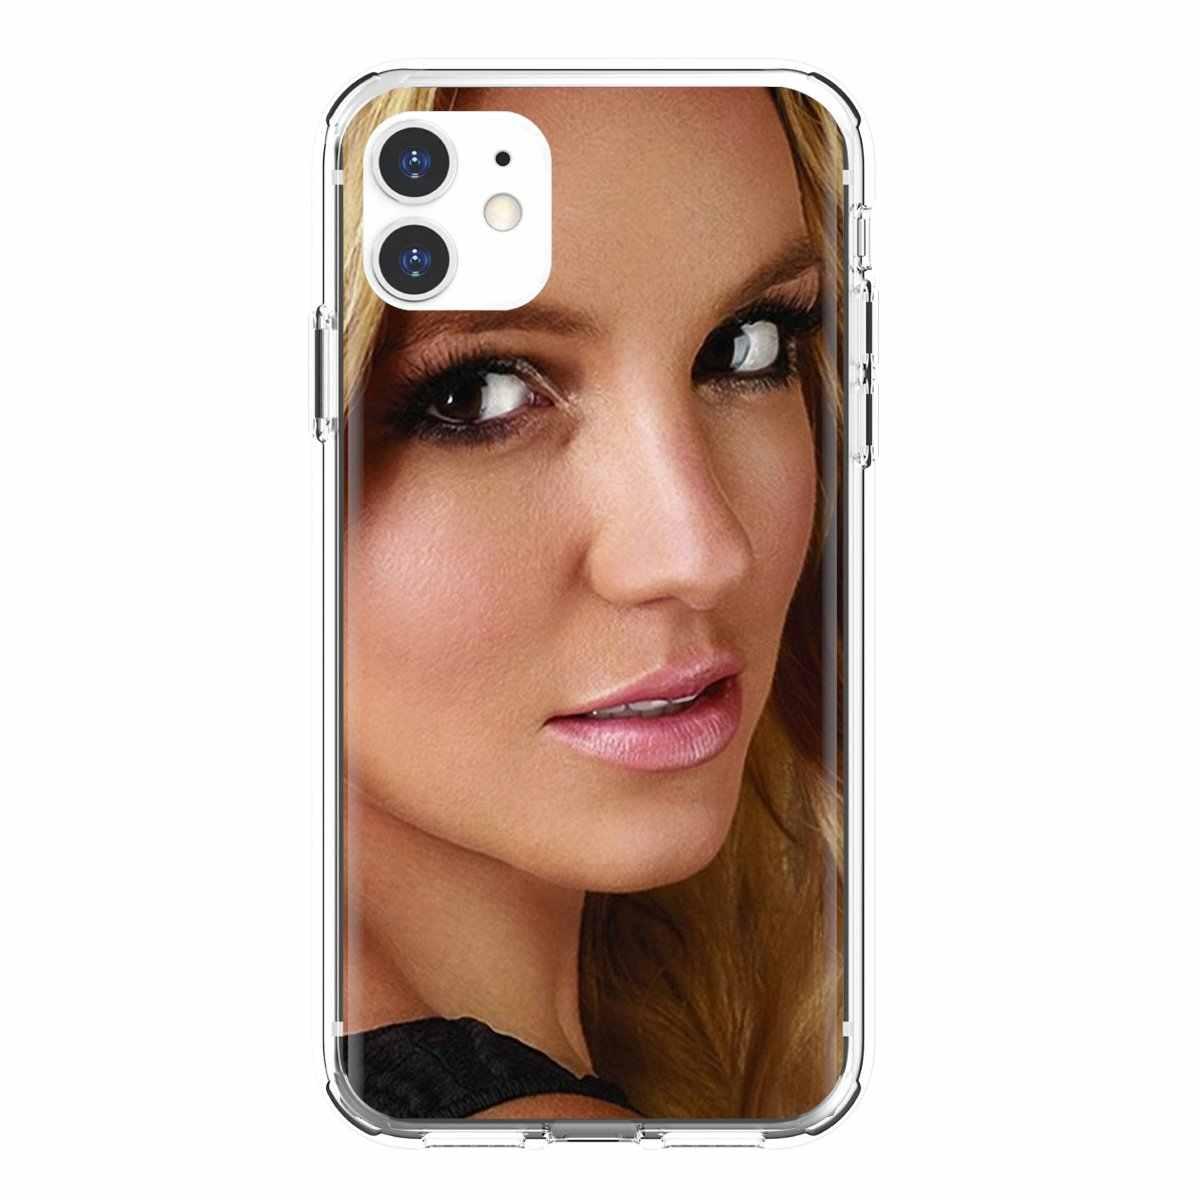 Für Xiaomi Mi5 Mi5S Mi6 Mi3 Mi4 Mi4i Mi4C Redmi Hinweis 2 3 3S 5 5A 6 6A Pro musik Britney spears Smartphone Silikon Telefon Fall